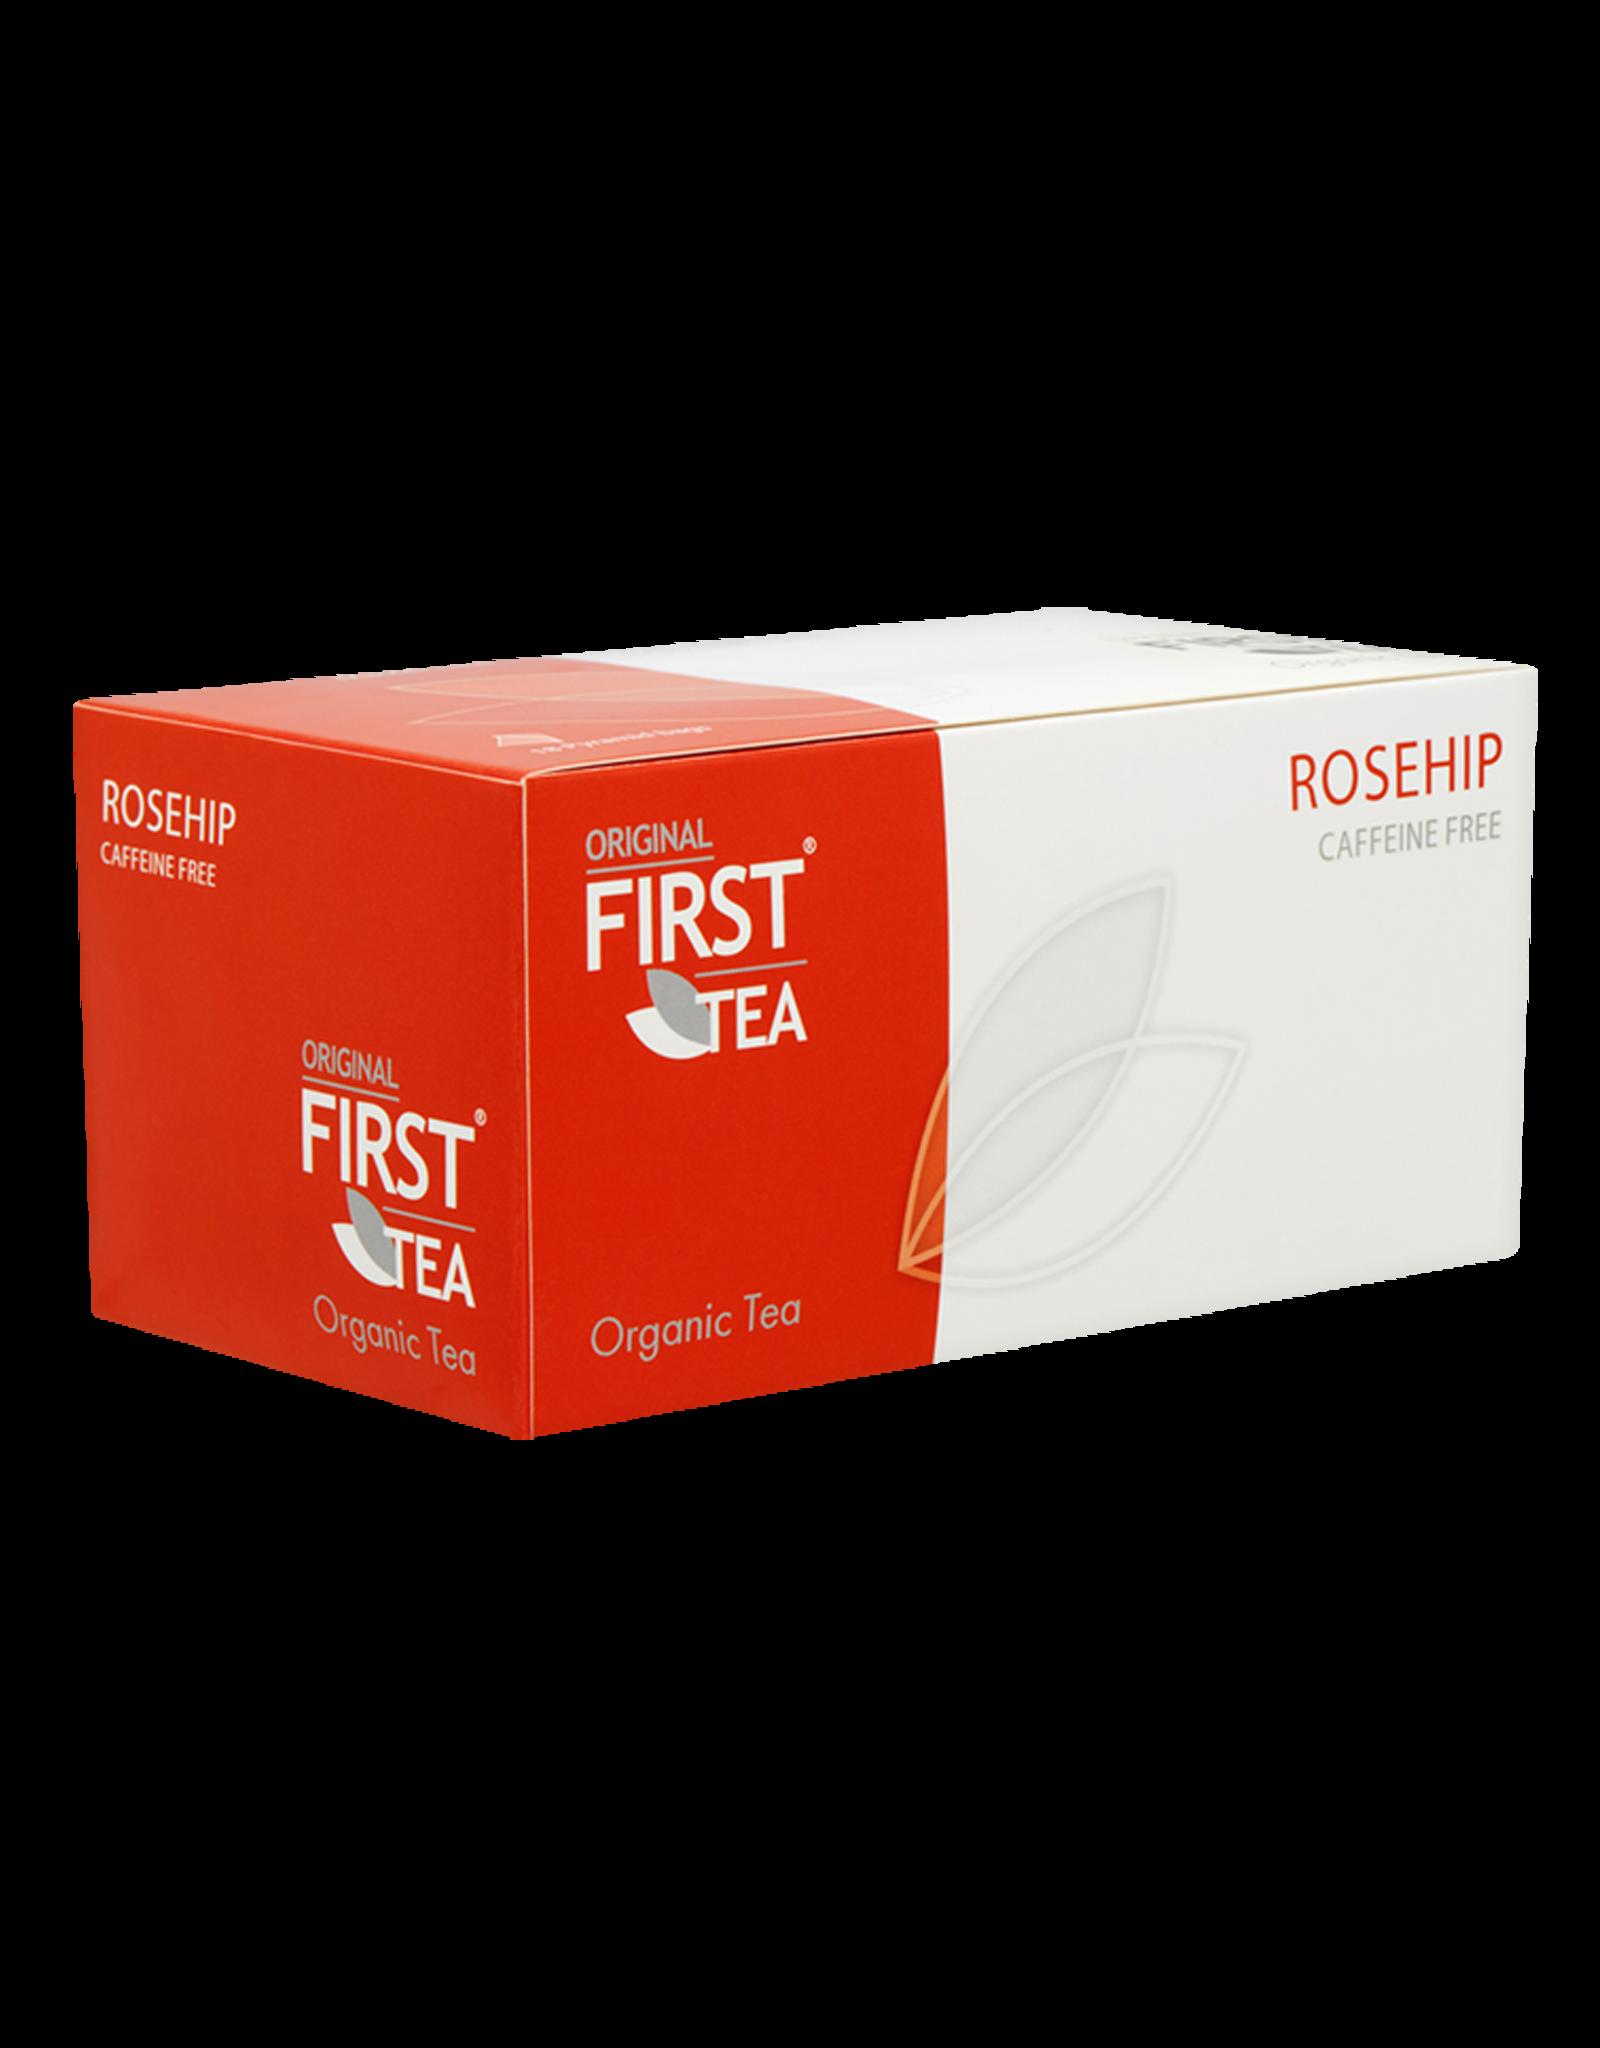 First Tea Master line Masterline Rosehip